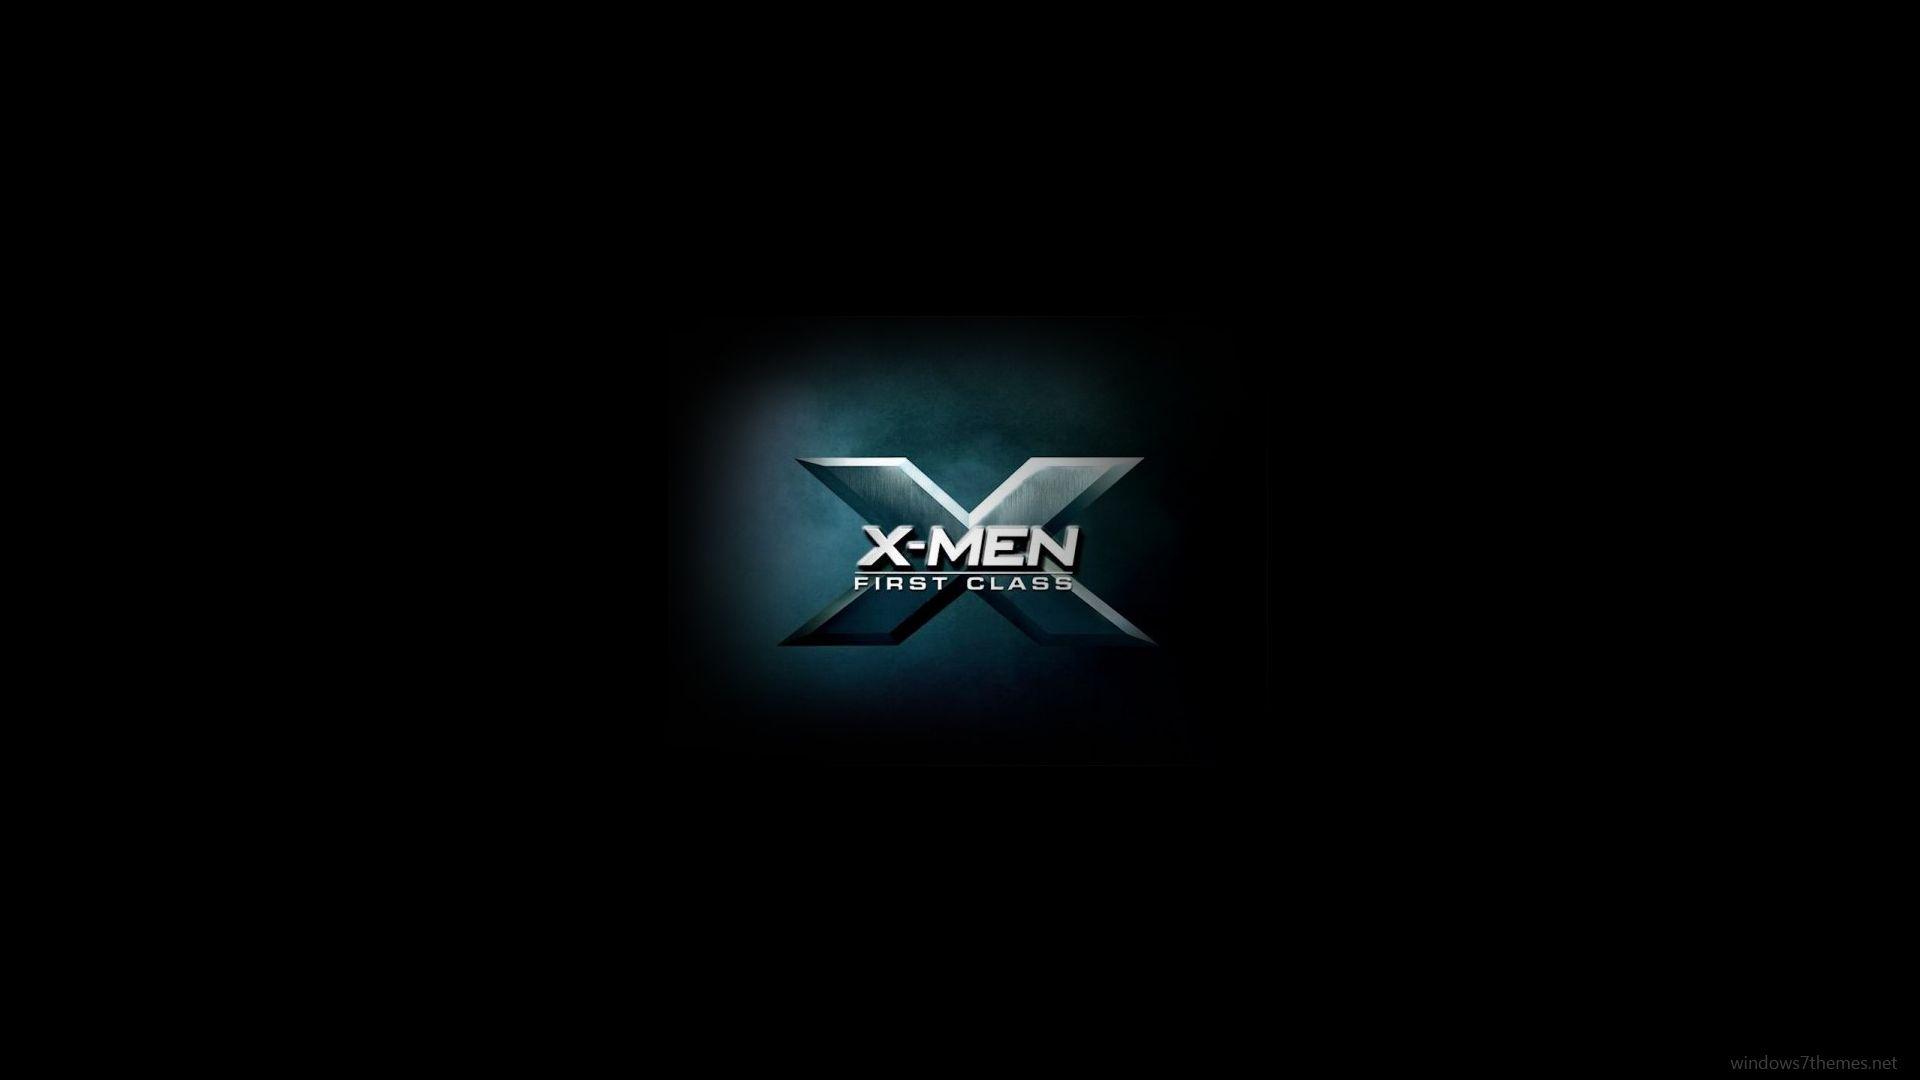 X Men Wolverine Wallpapers Wallpaper